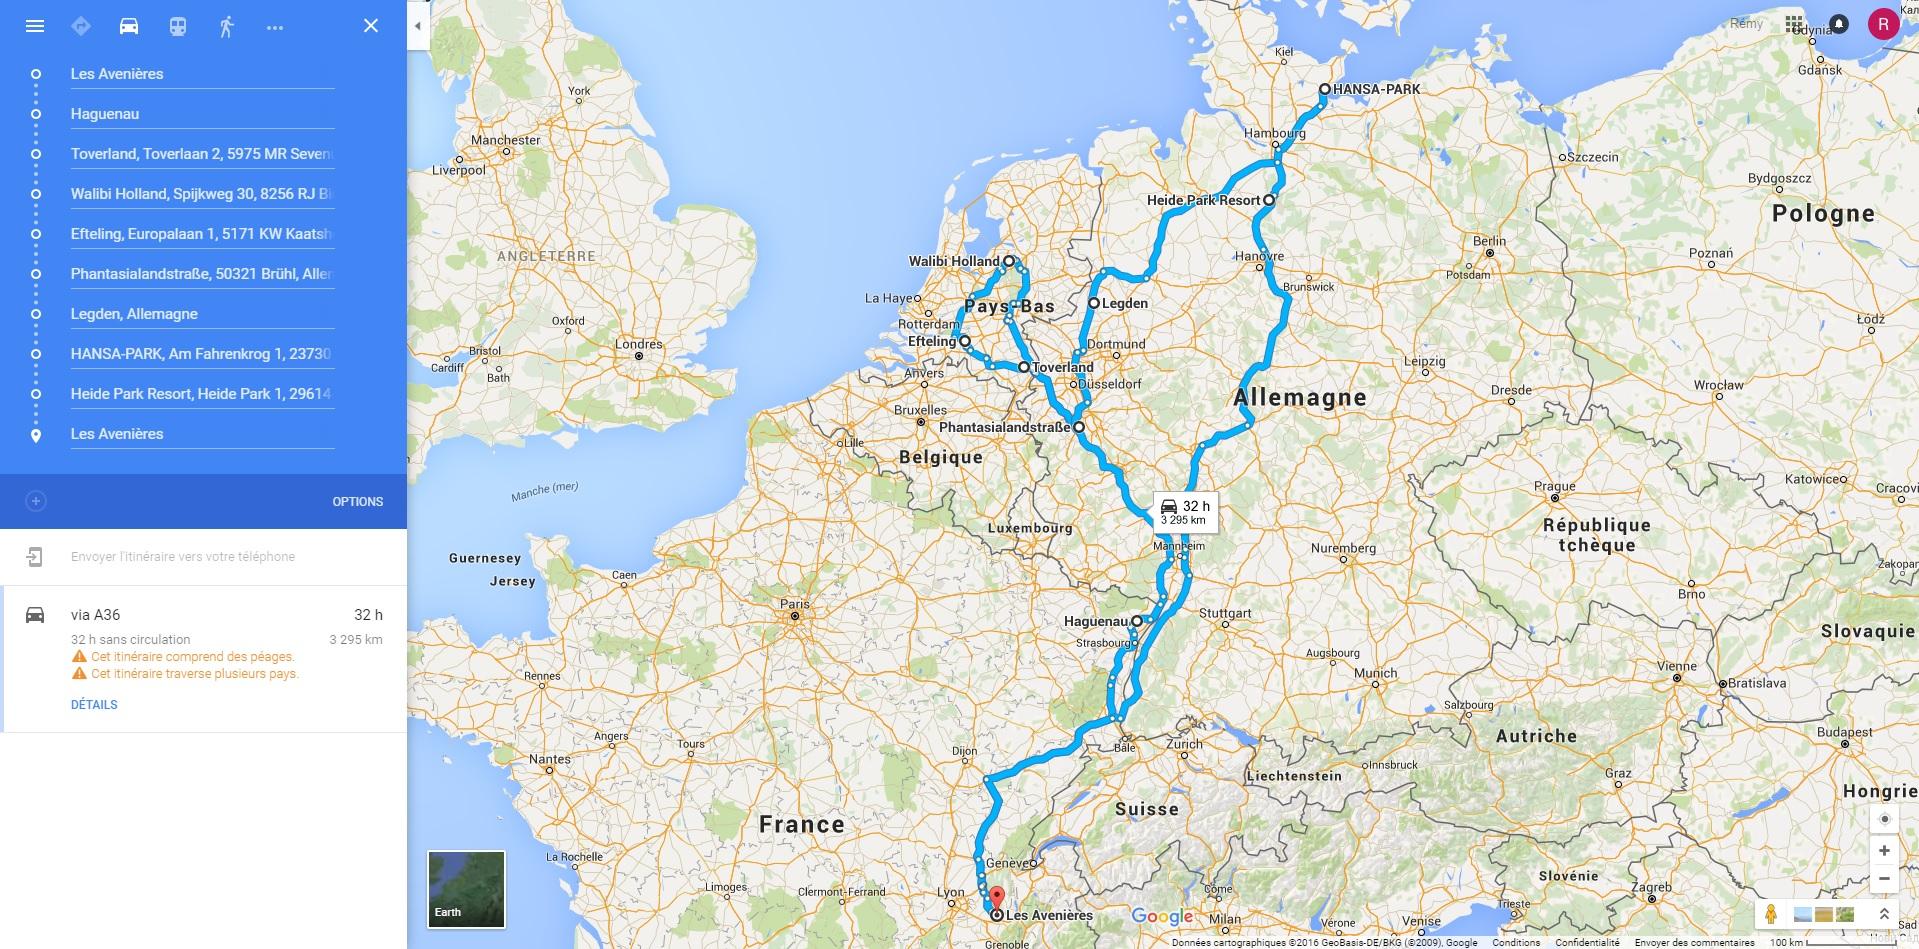 trip Allemagne_Pays-Bas